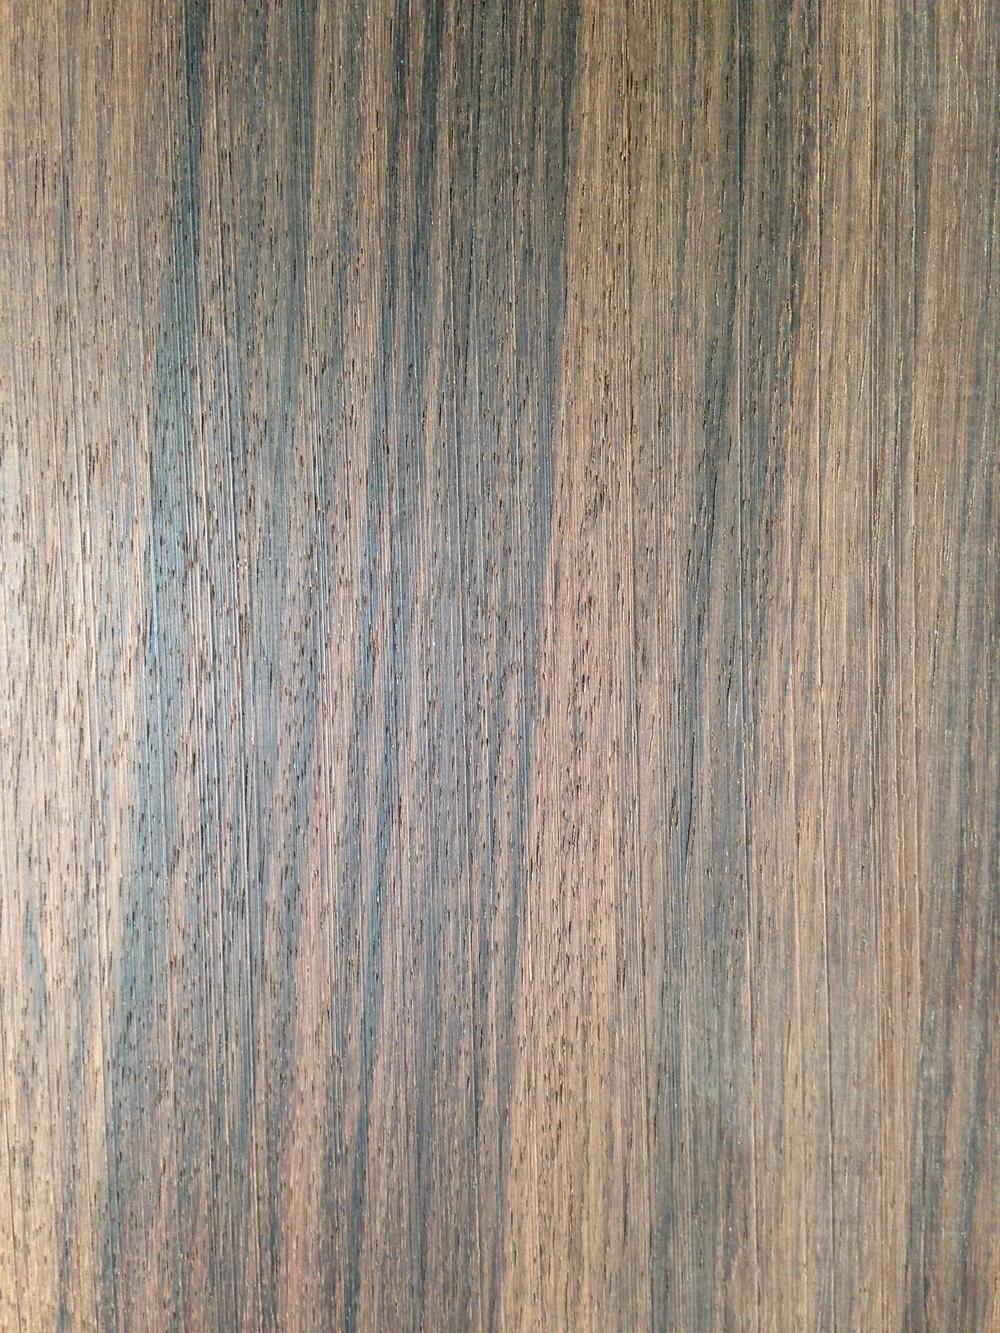 Brazilian rosewood